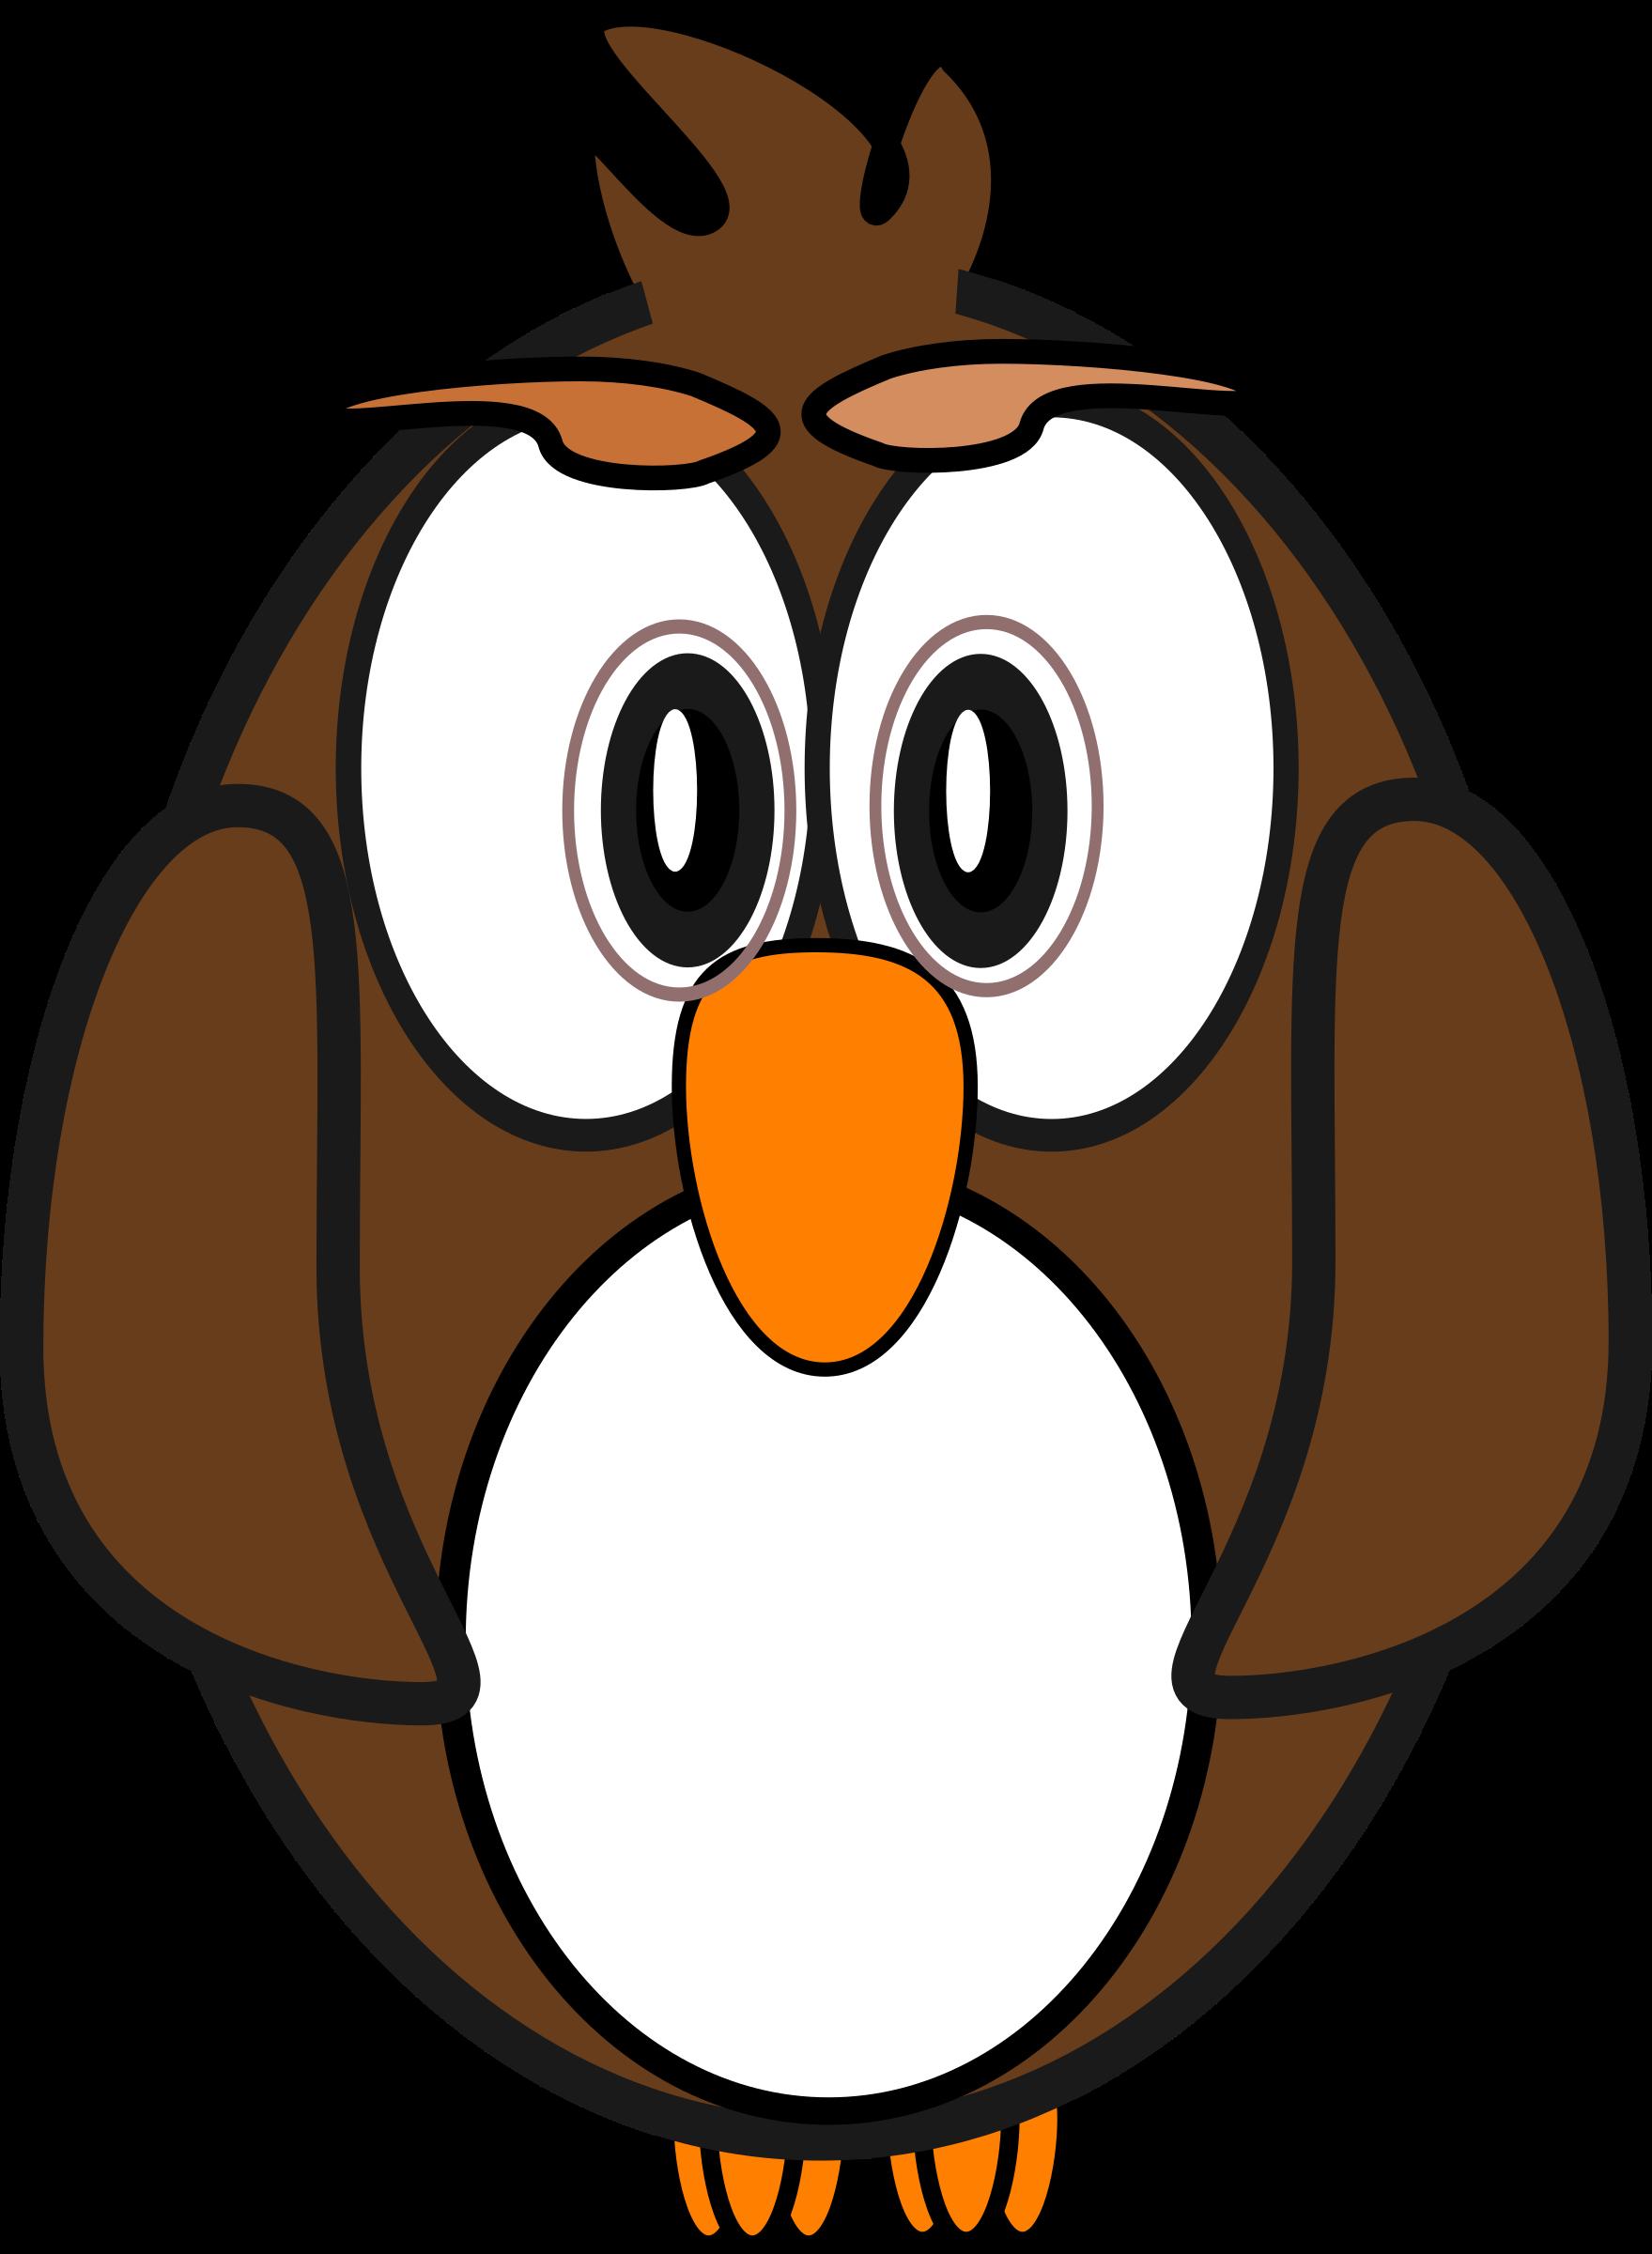 Big image png. Circle clipart owl